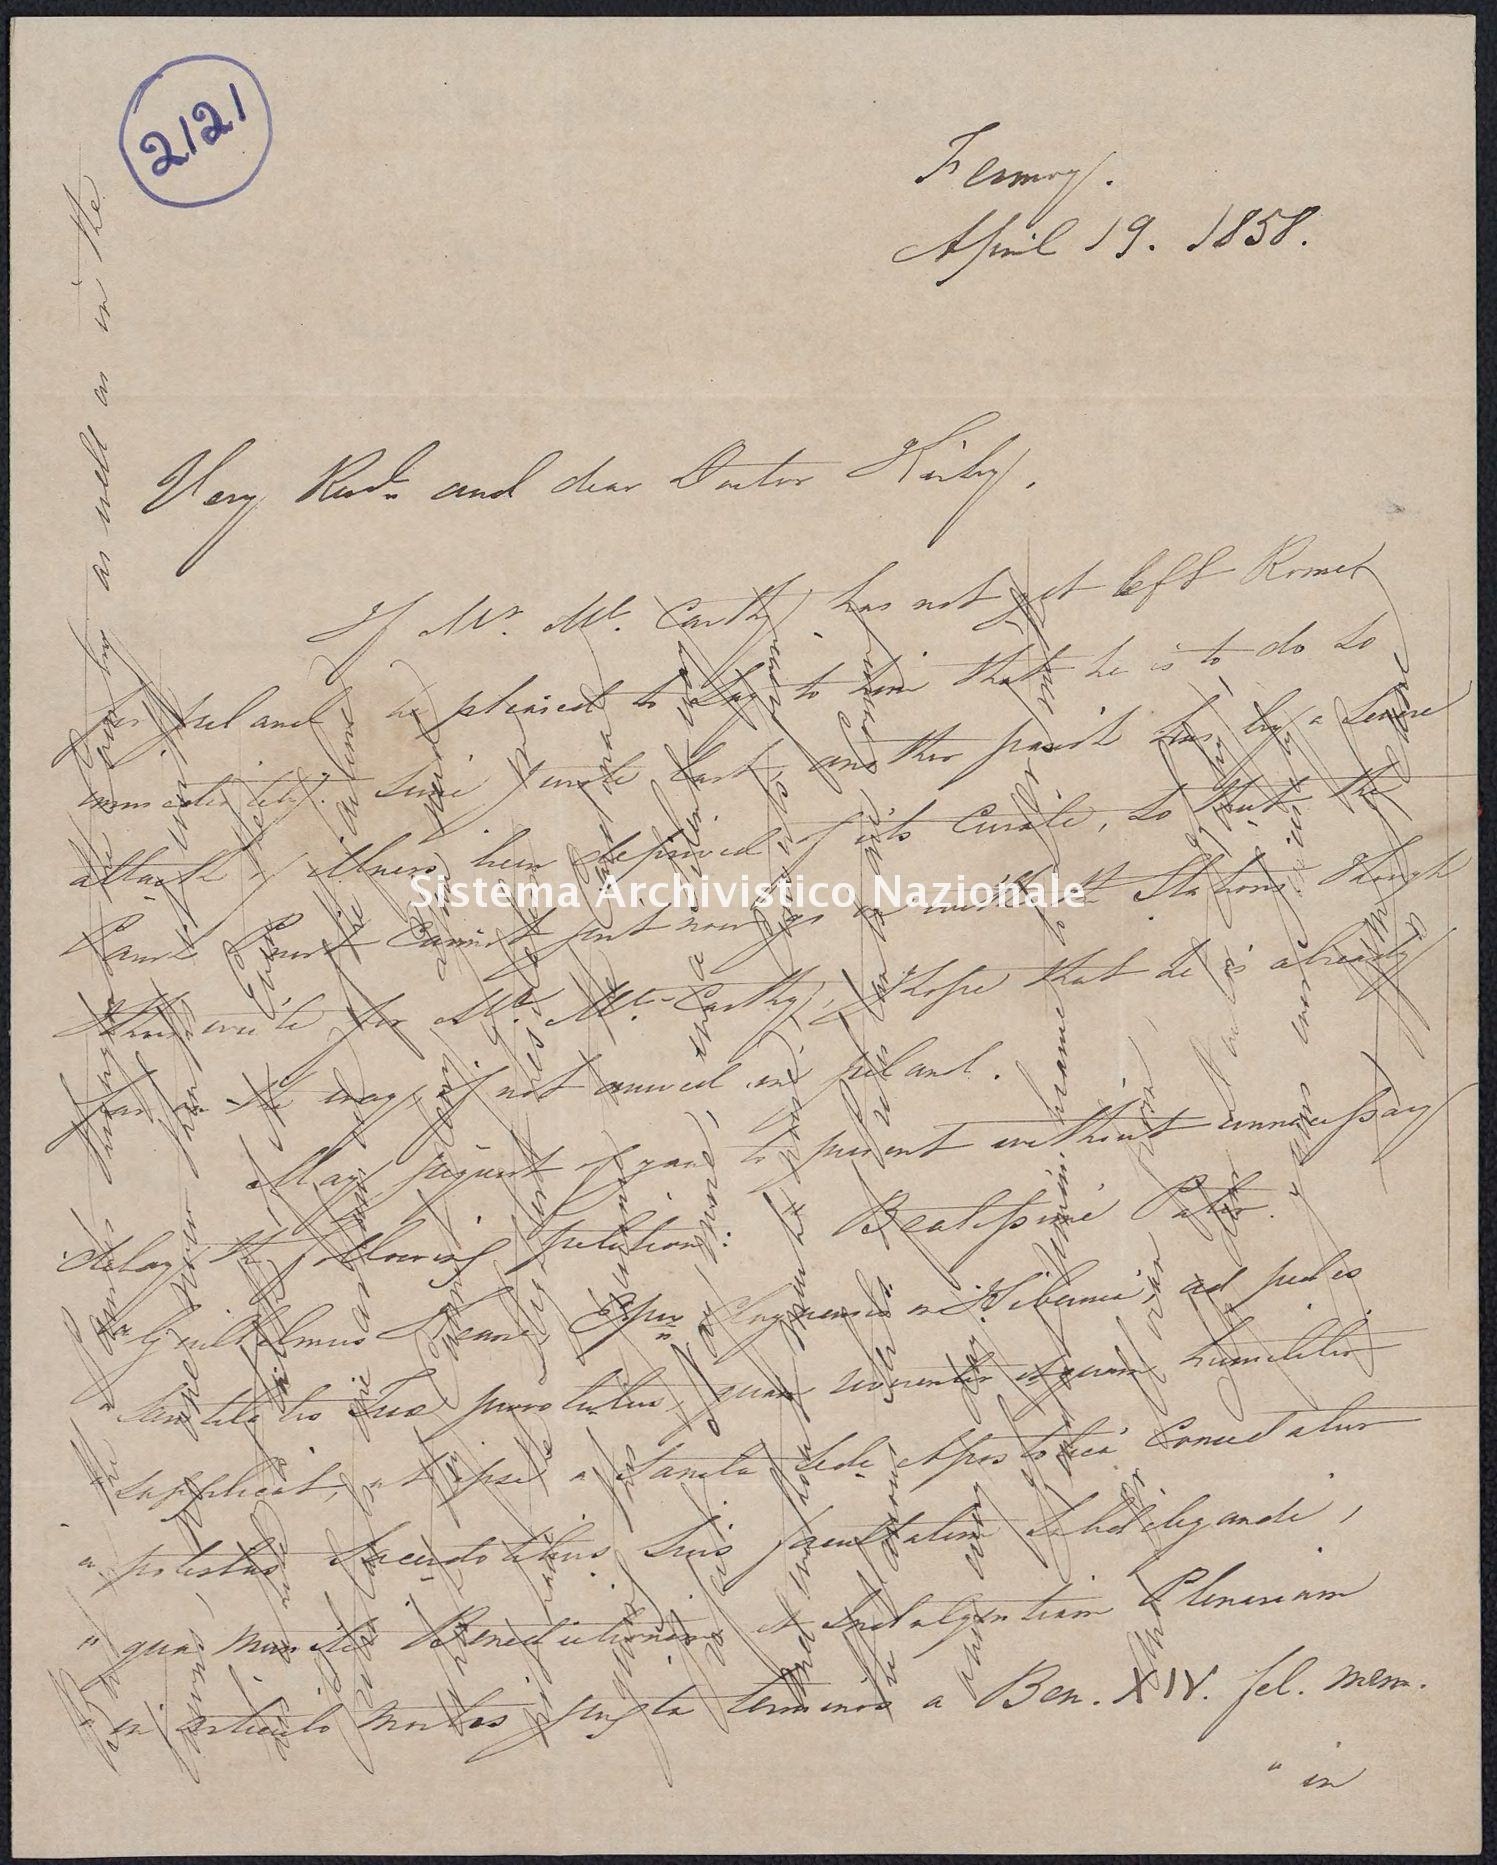 Pontificio Collegio Irlandese - Kirby_1858_2121